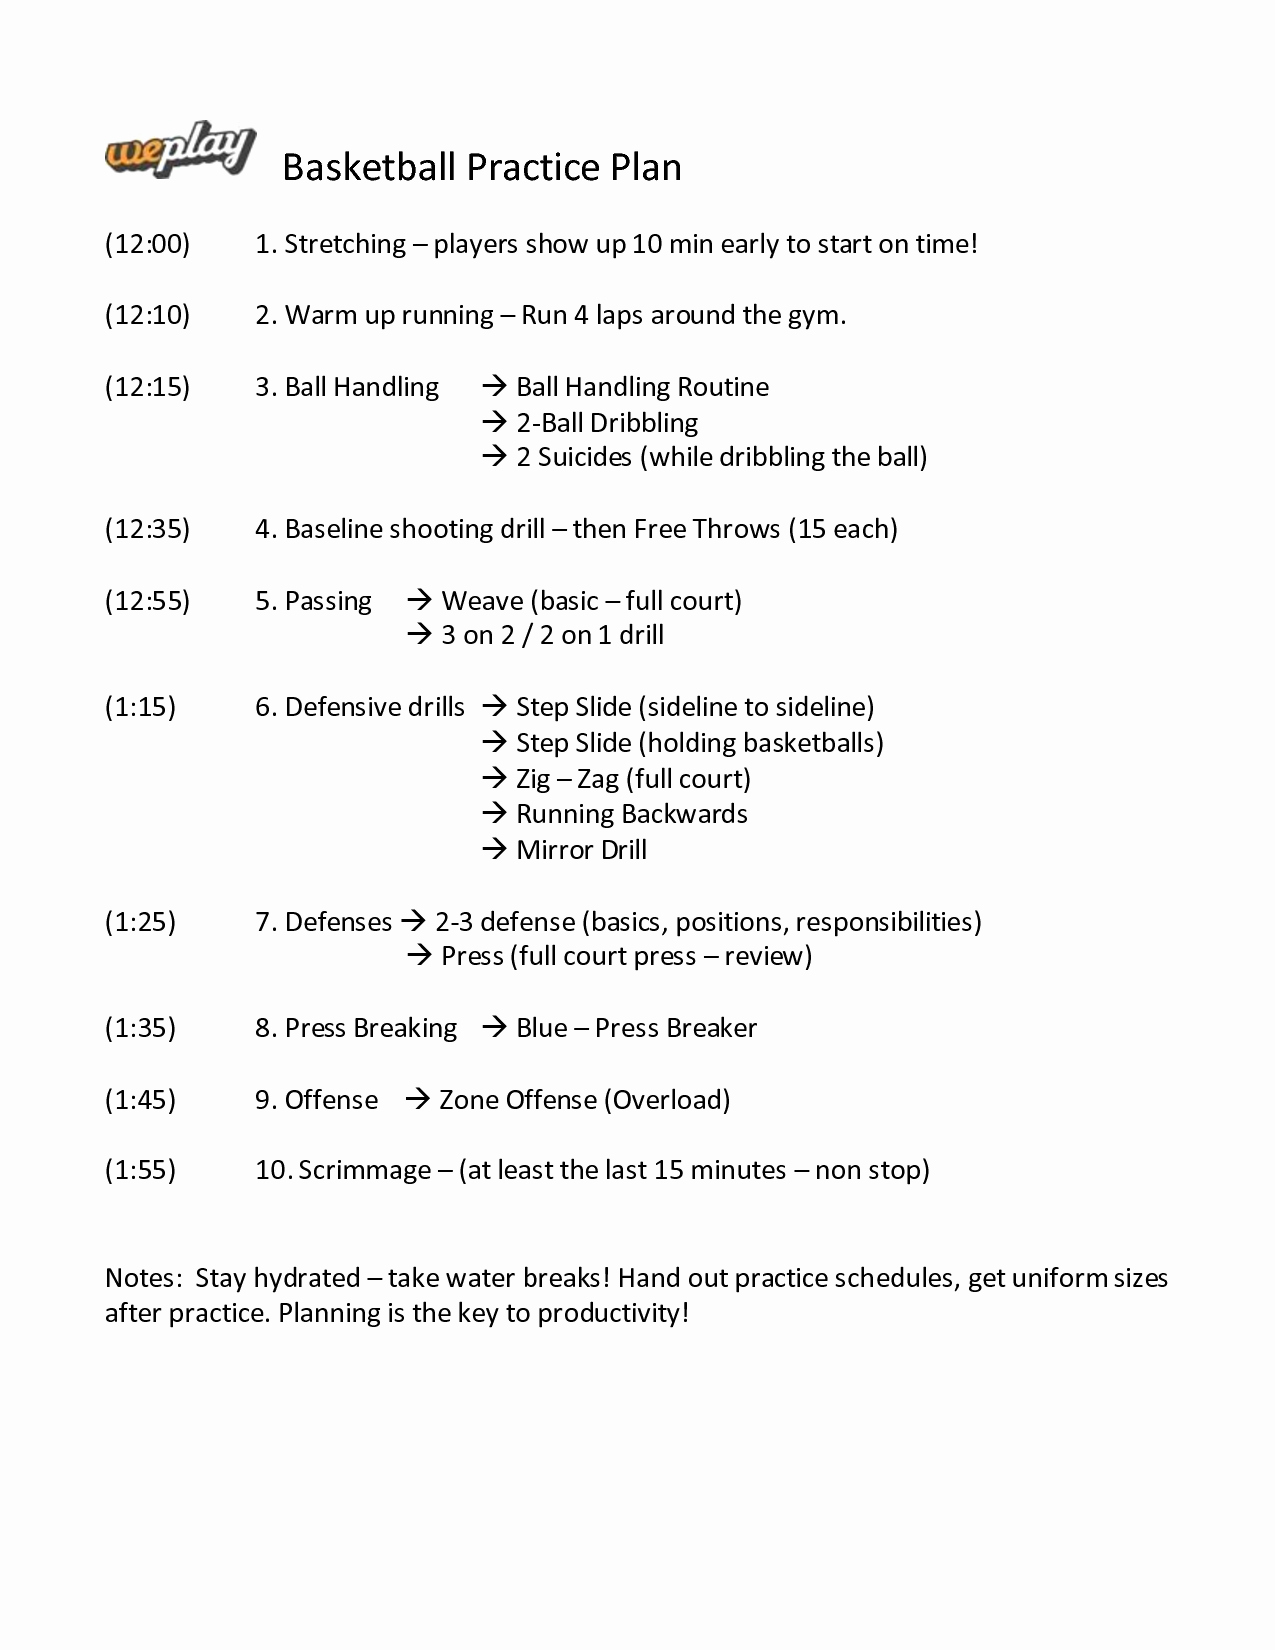 Basketball Practice Plan Template Beautiful Basketball Practice Plan Template